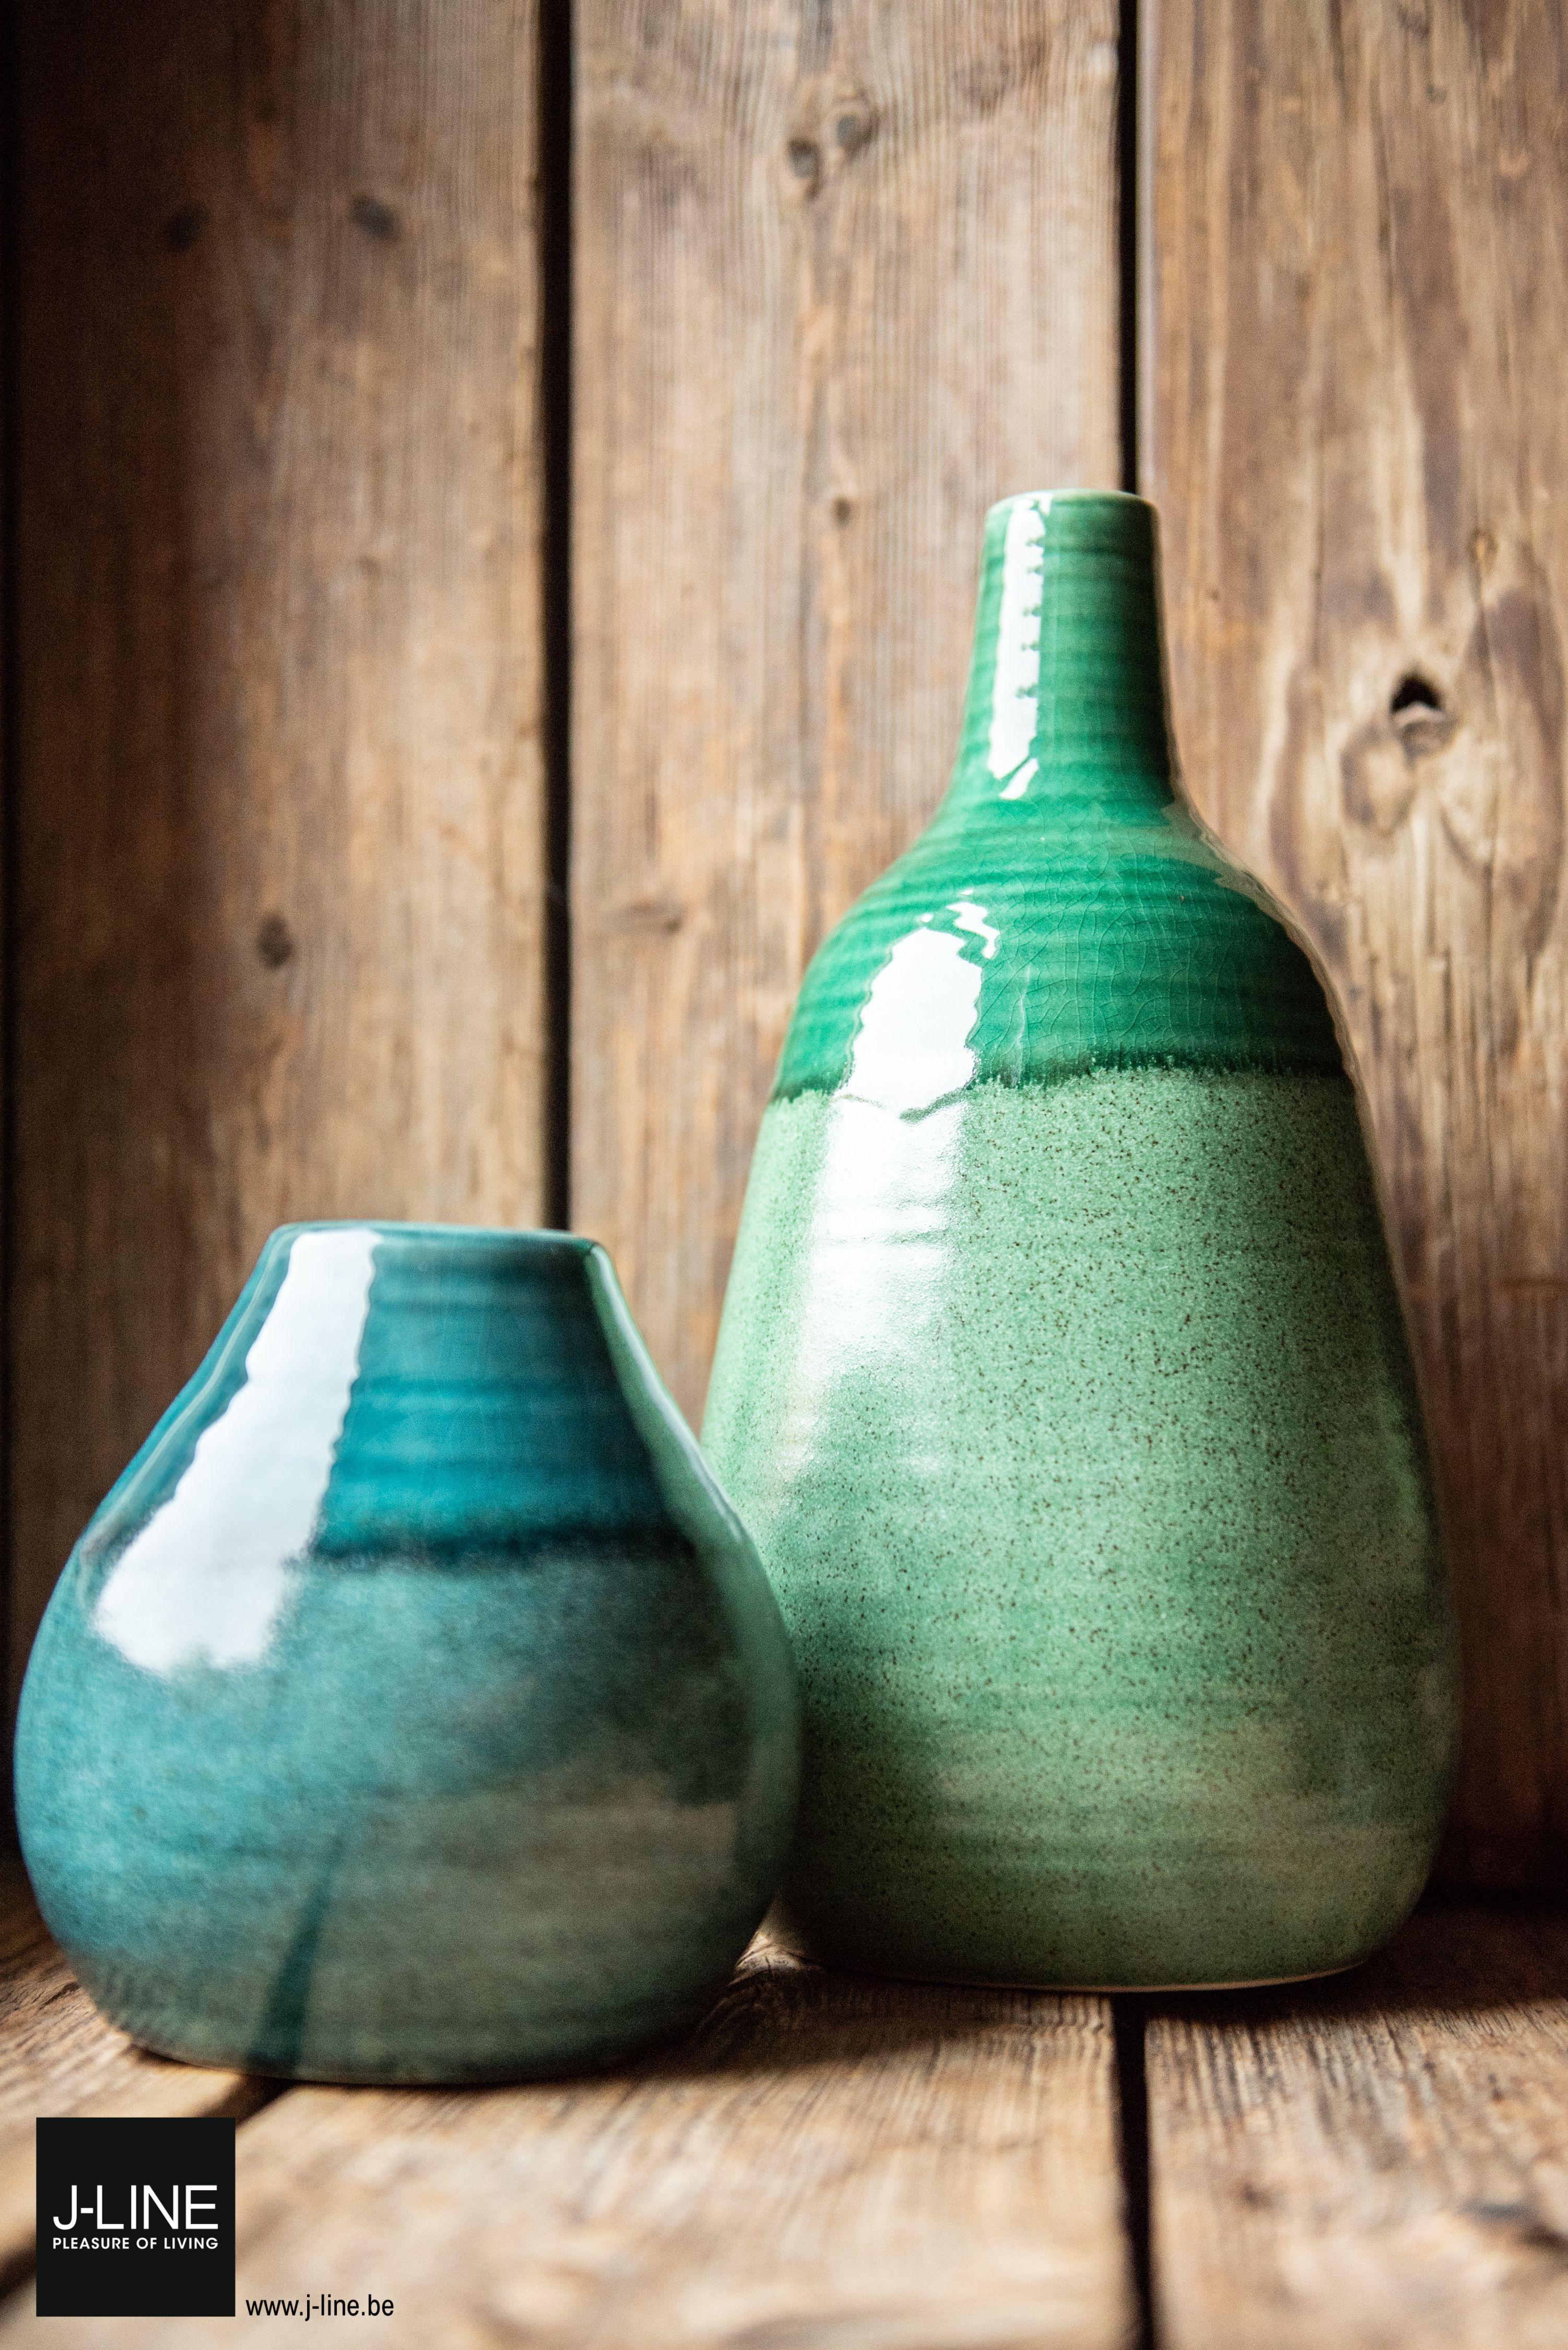 Jline Decoration Bistro Retro Spring Summer Ss2019 New Collection Vase Ball Earthenware Green Pleasureofliving Jlinedecoration